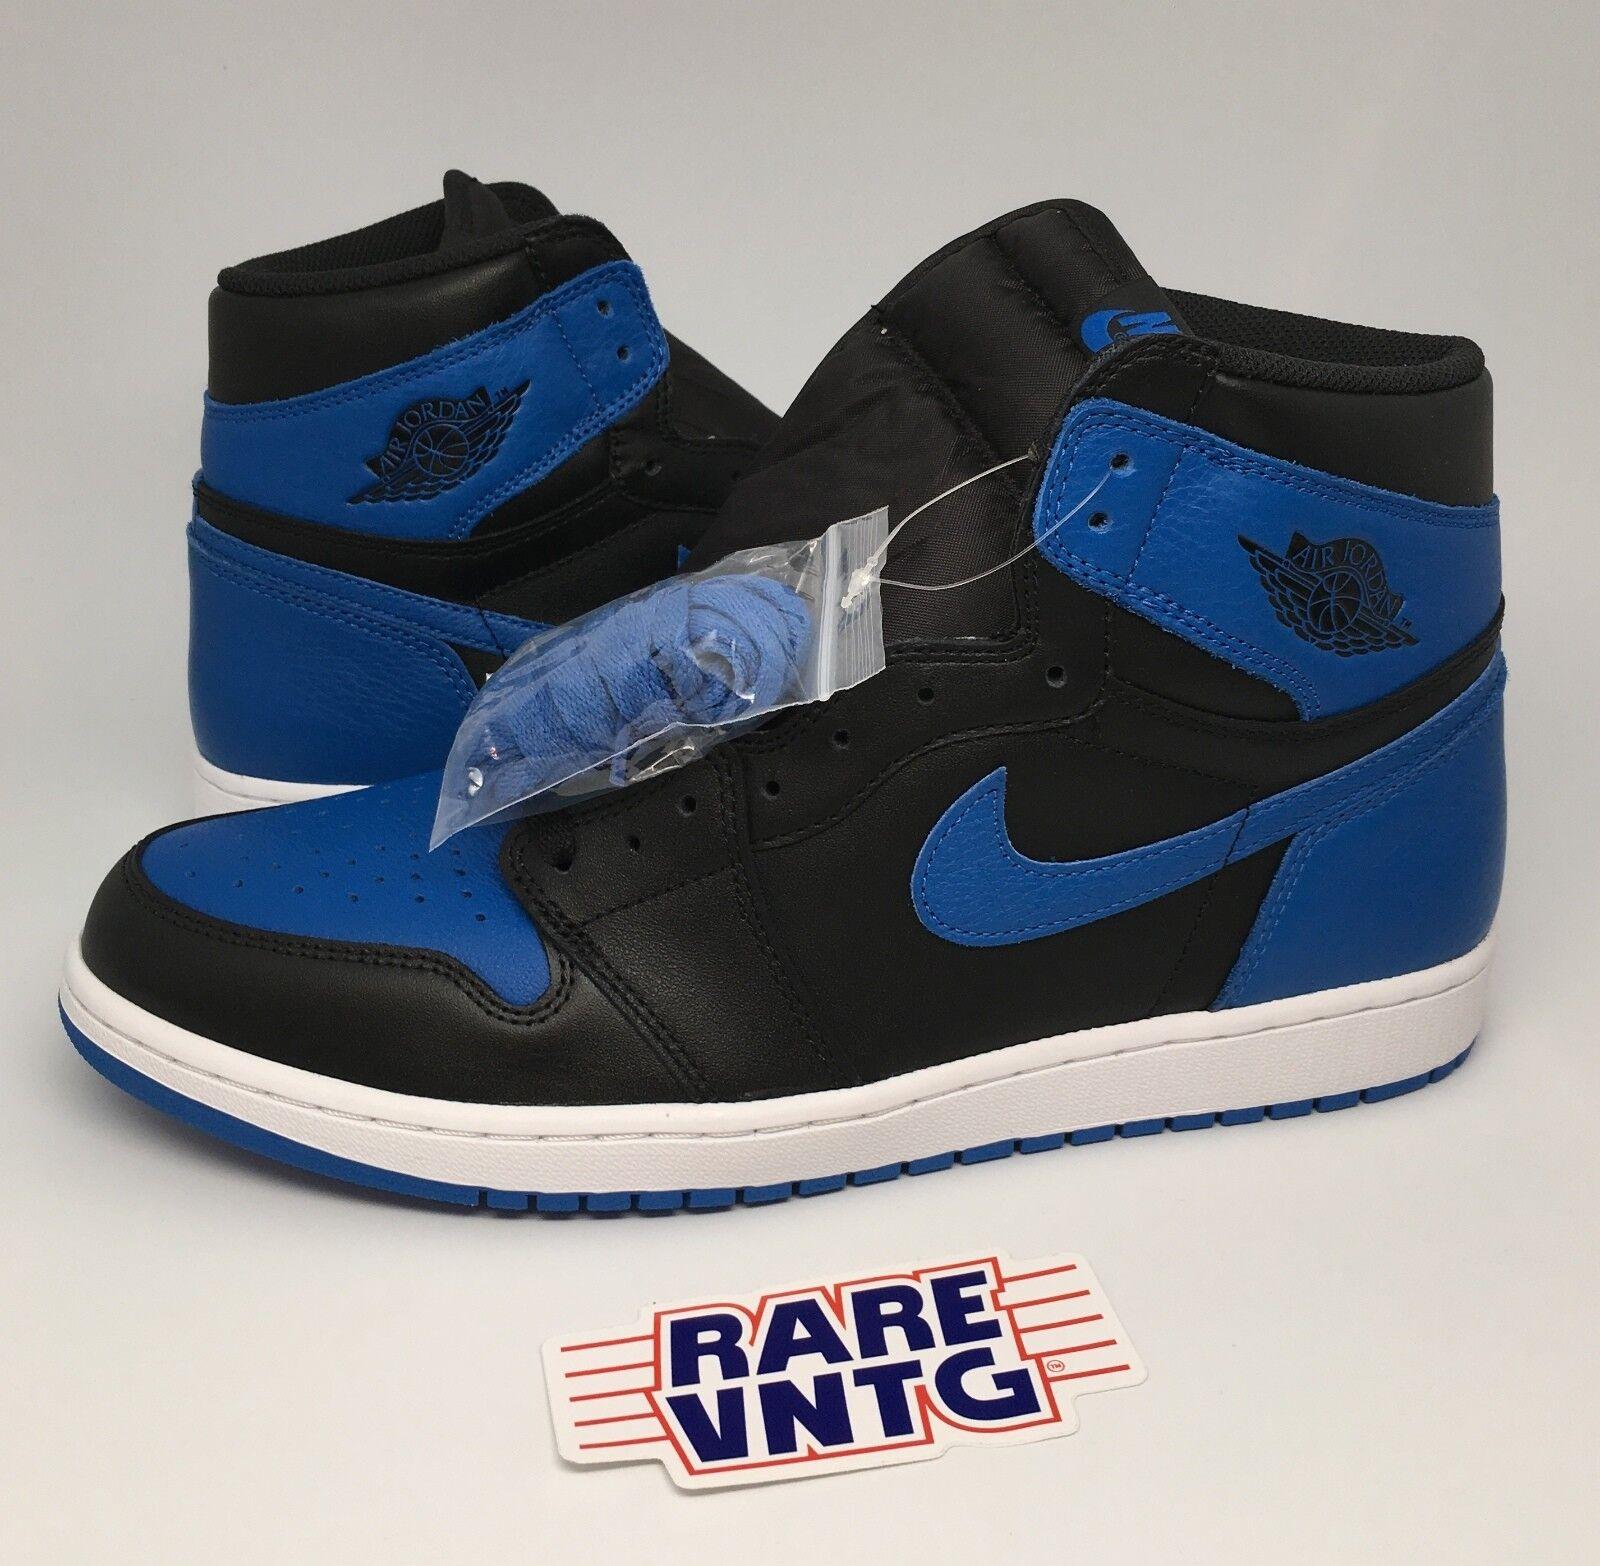 2017 Nike Air Jordan Blue 1 Retro Sneakers Royal Blue Jordan Black Size 13 Deadstock Bred 4cdbda